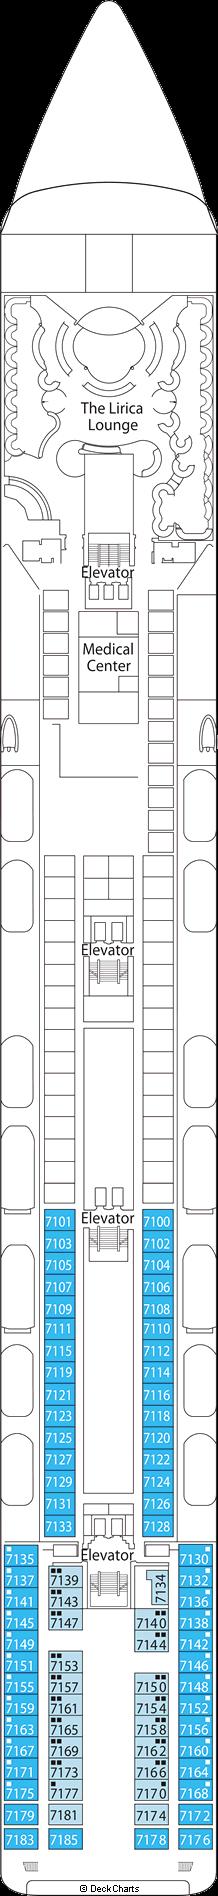 MSC Lirica: Scarlatti Deck